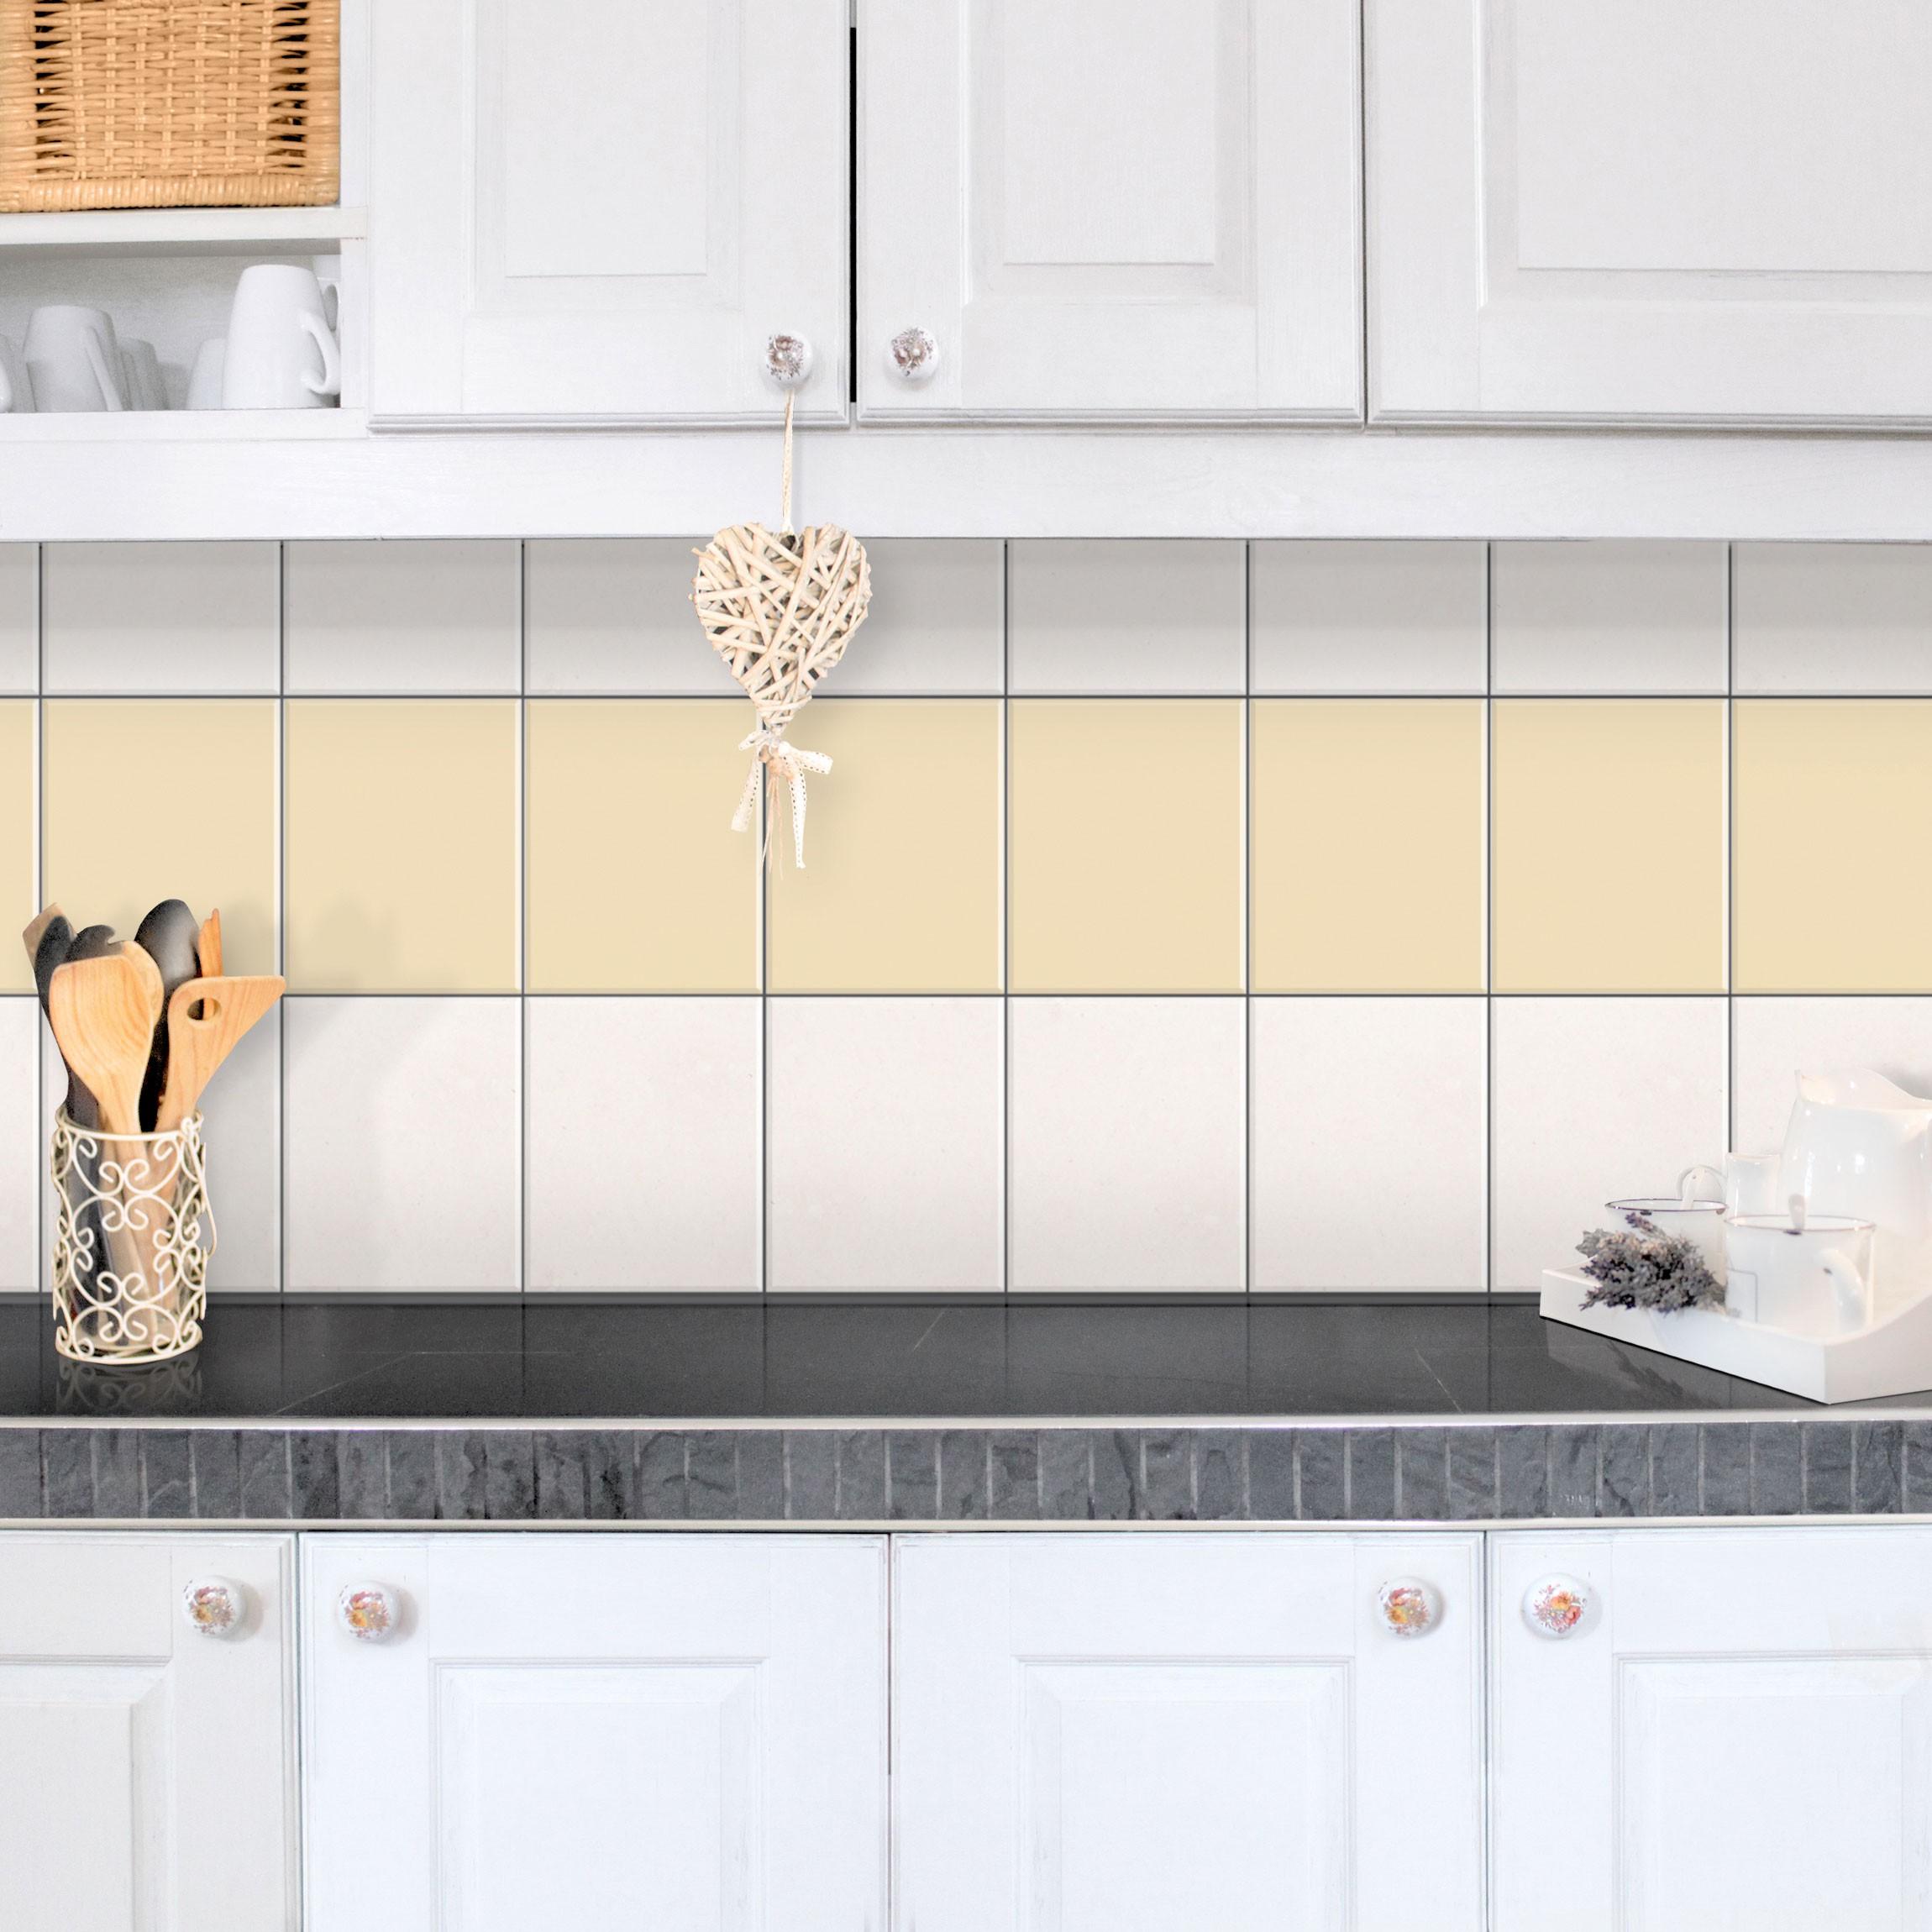 fliesen bord re colour light brown 25x20 cm fliesenaufkleber beige. Black Bedroom Furniture Sets. Home Design Ideas